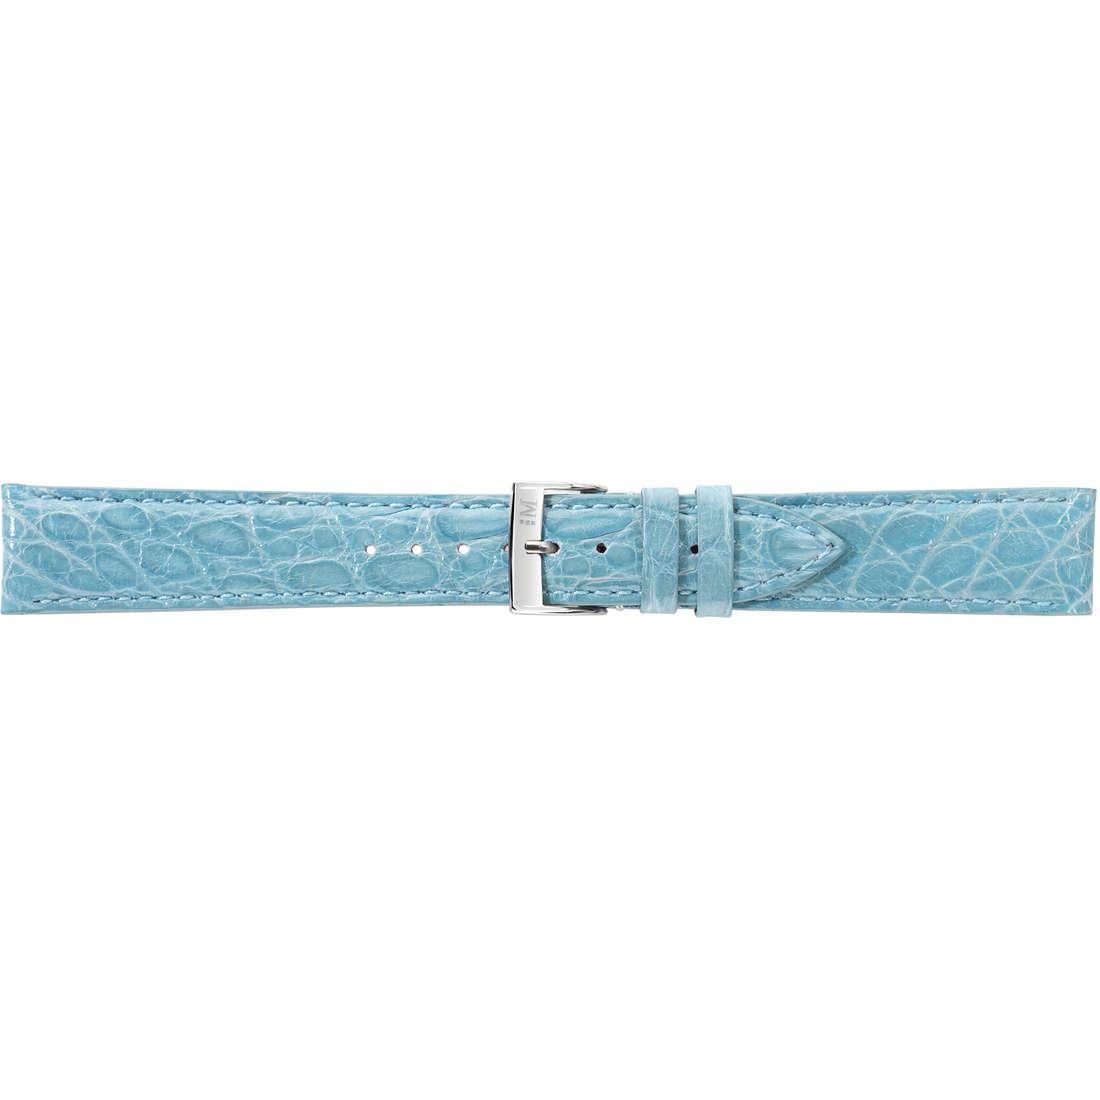 watch watch bands watch straps man Morellato Pelli Preziose A01X2197052168CR12